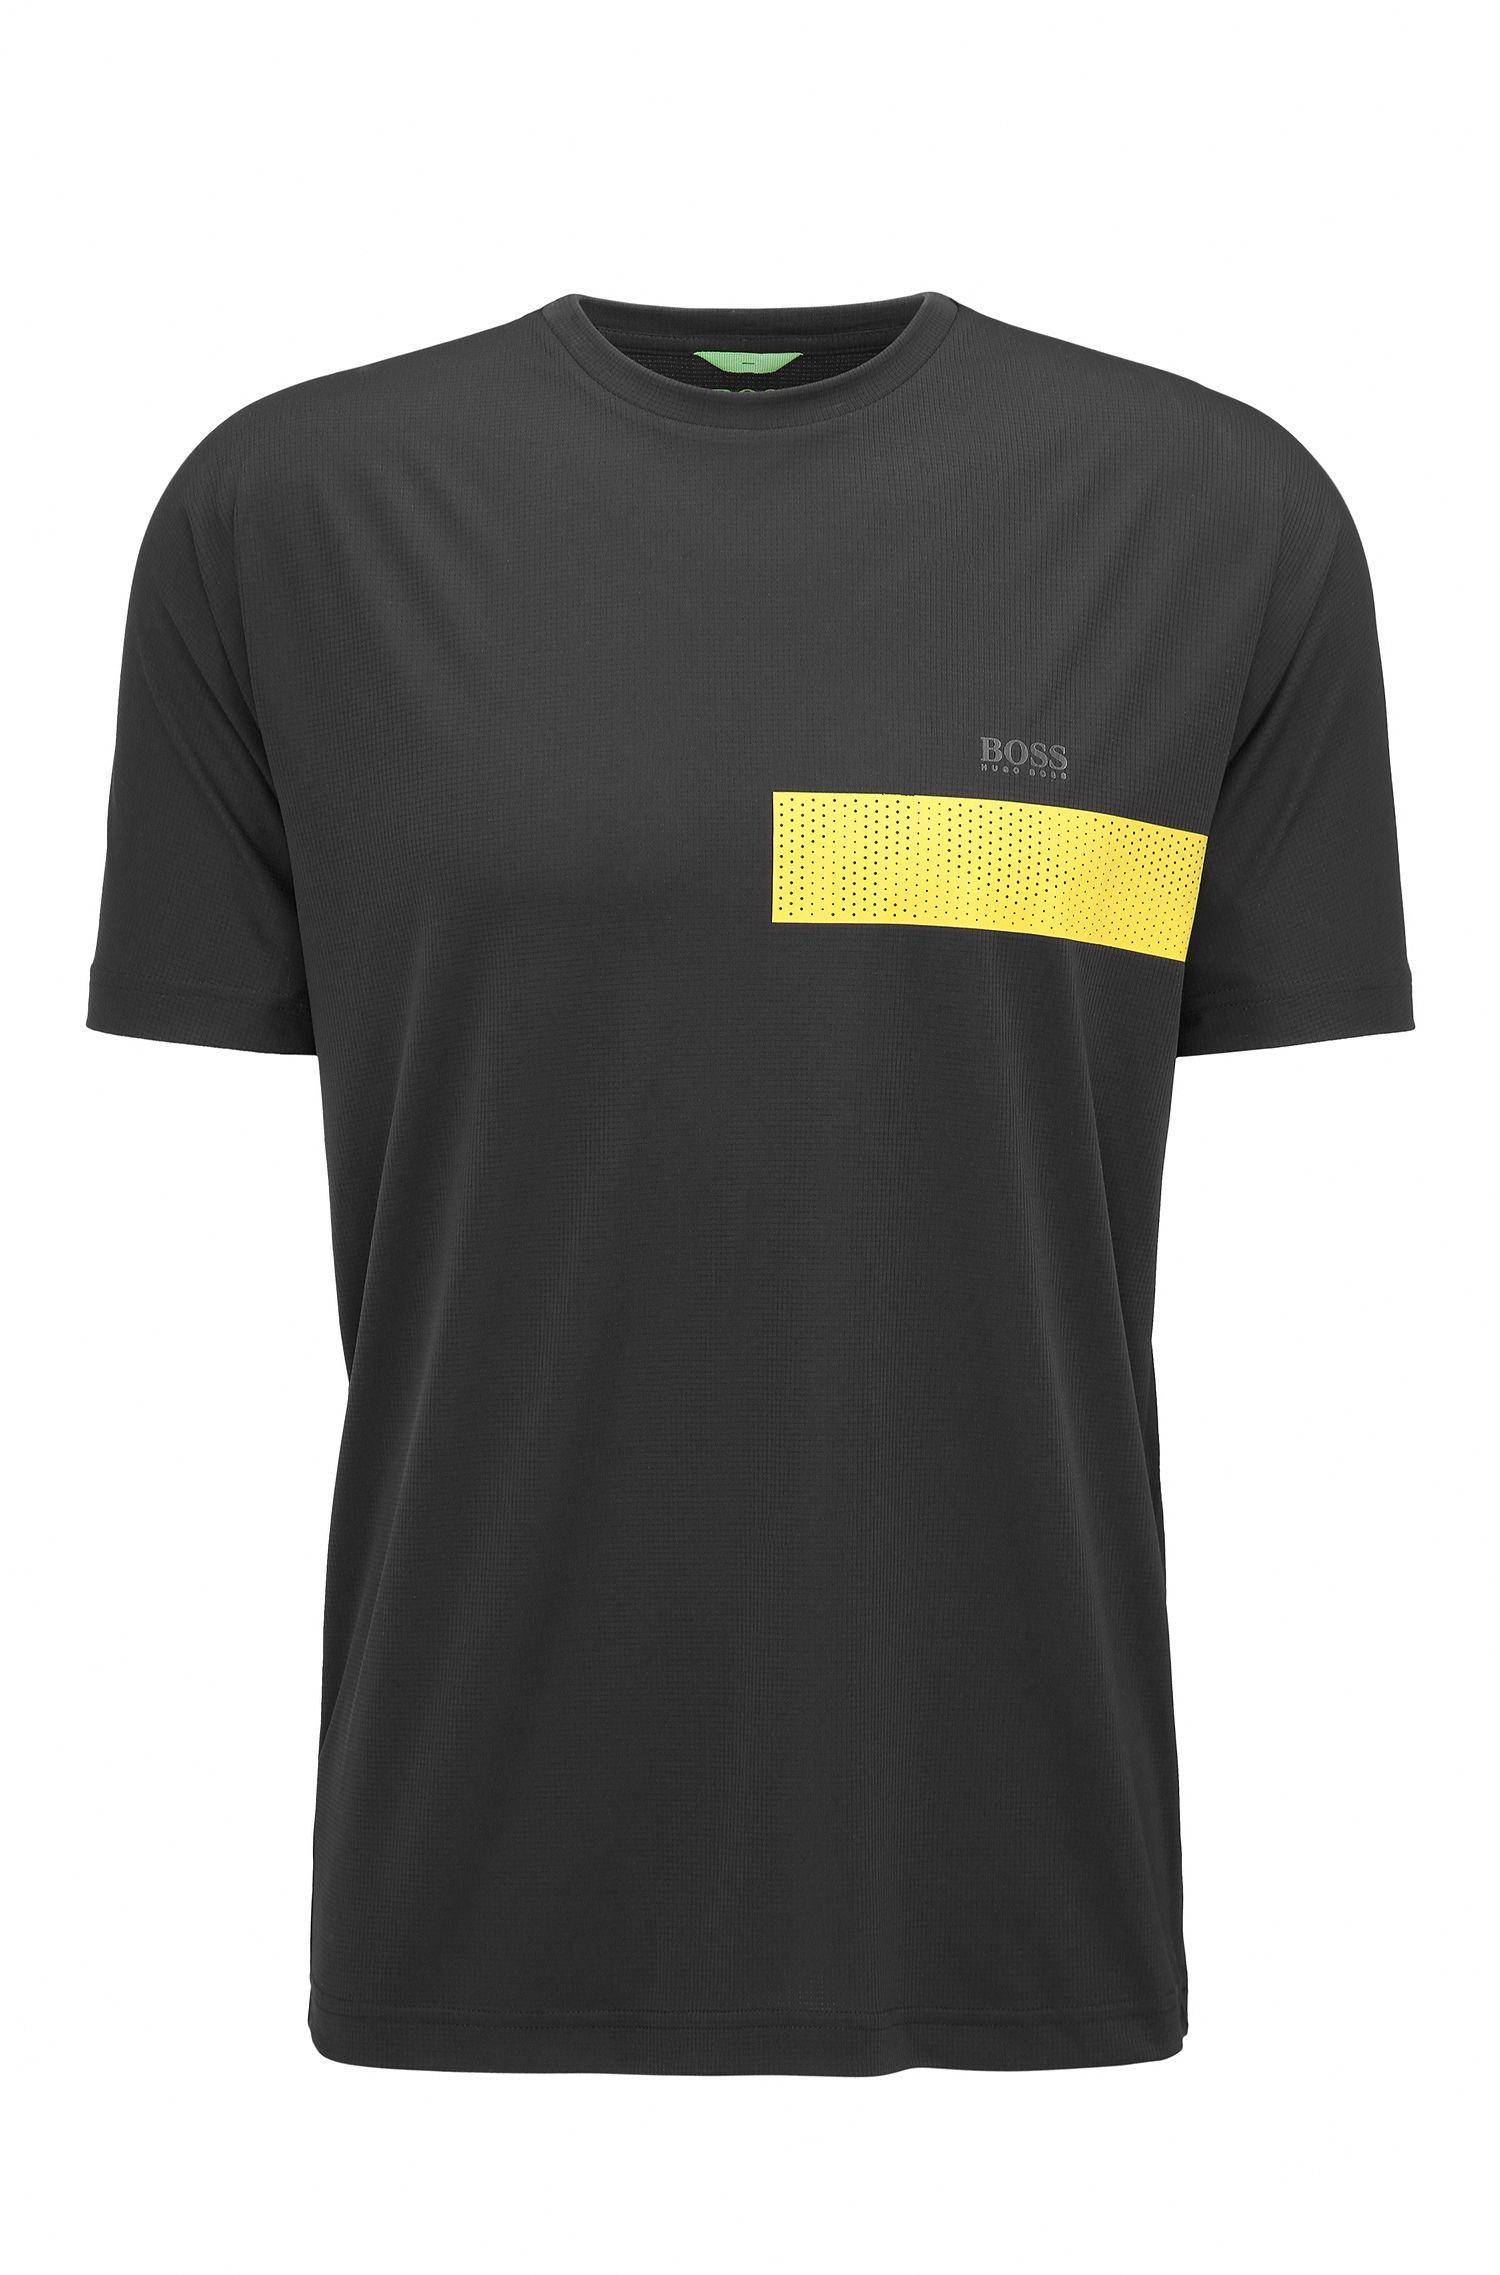 Graphic Print Jersey T-Shirt | Tijotech